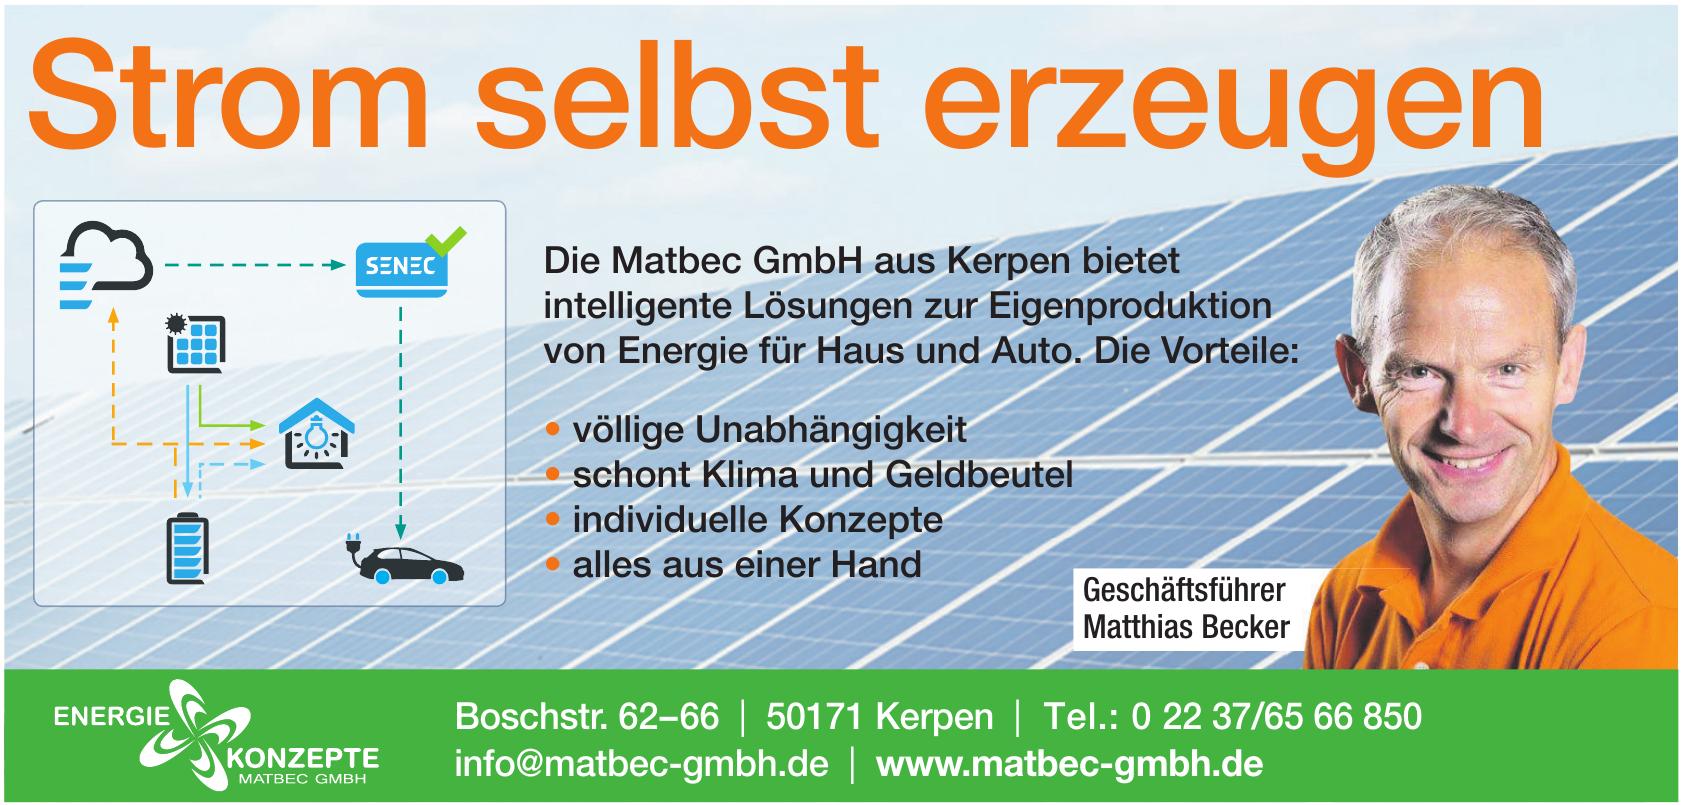 Matbec GmbH